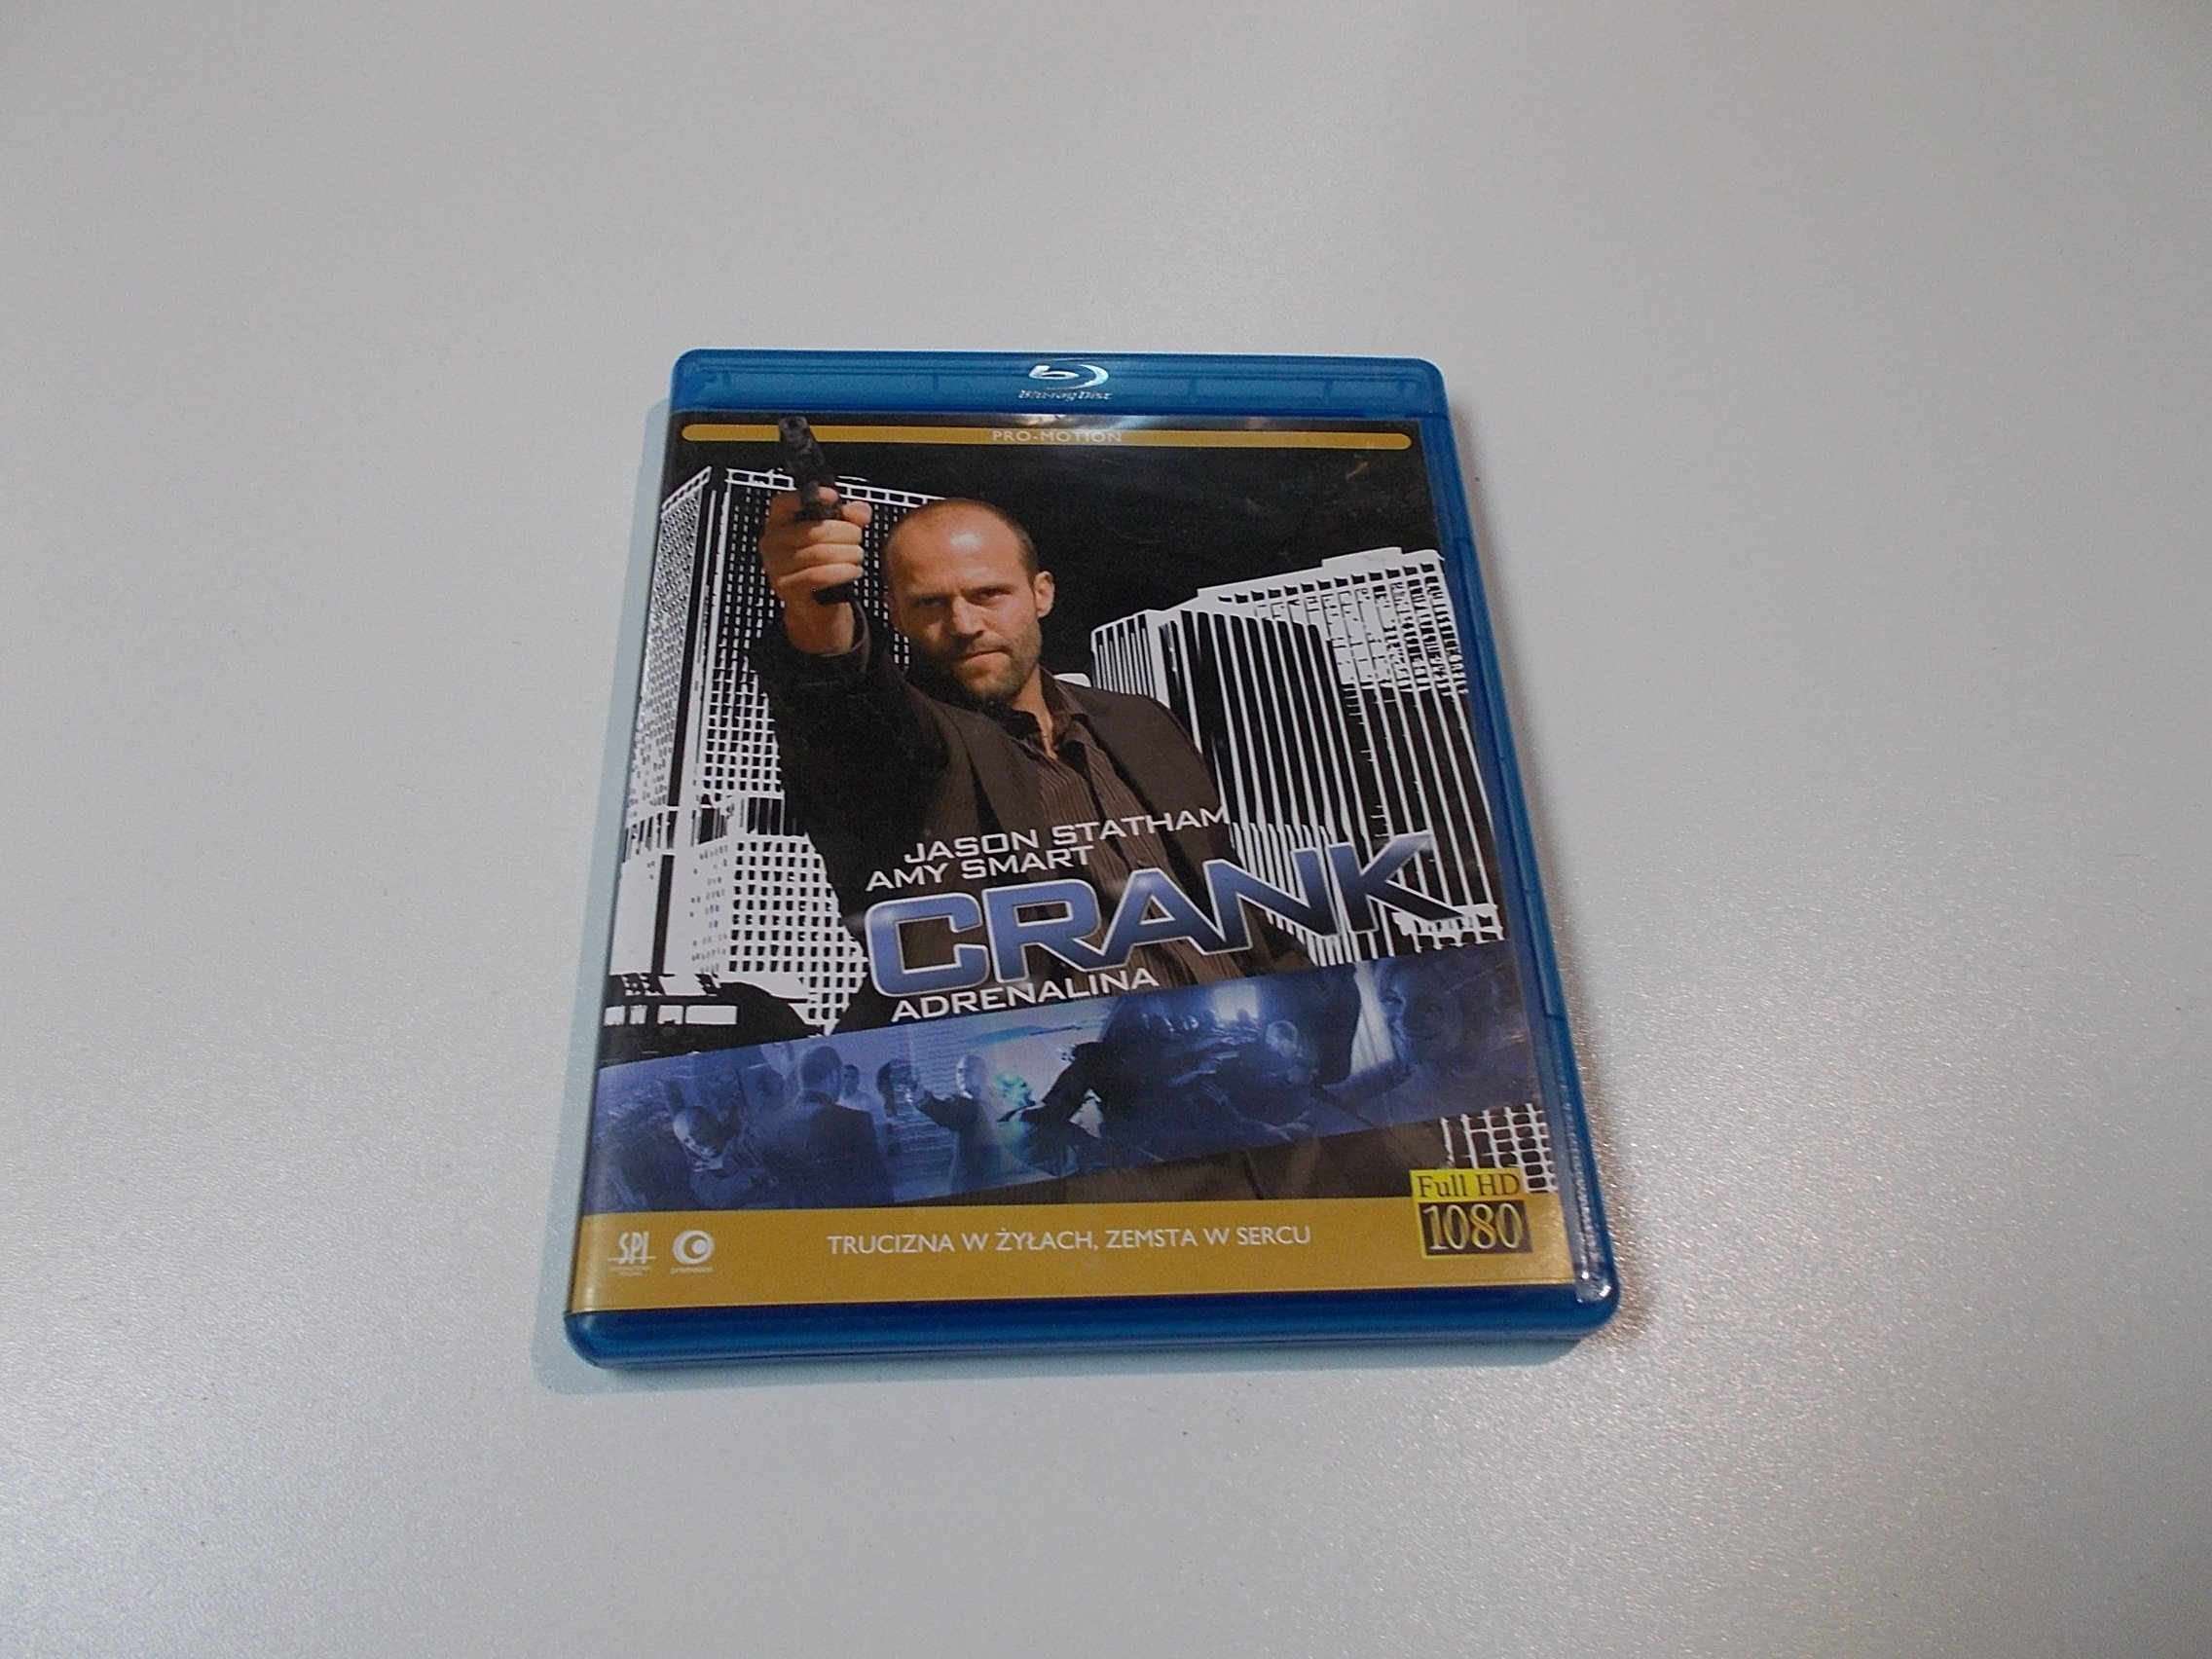 Crank - Adrenalina - Blu-ray - Sklep